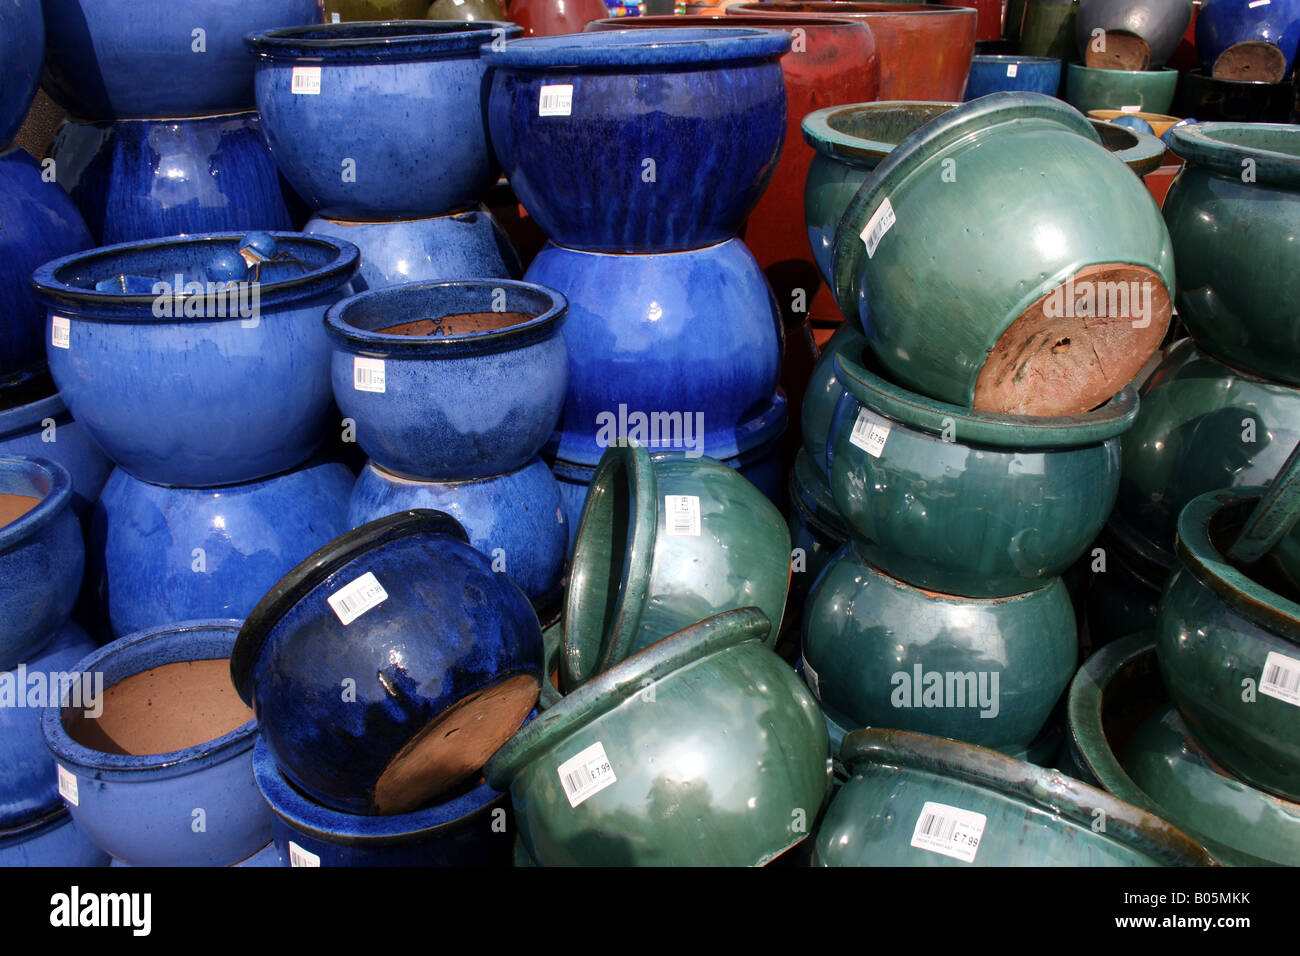 Chine Bleu Et Vert Jade Jardin Pots De Fleurs En Ceramique Emaillee